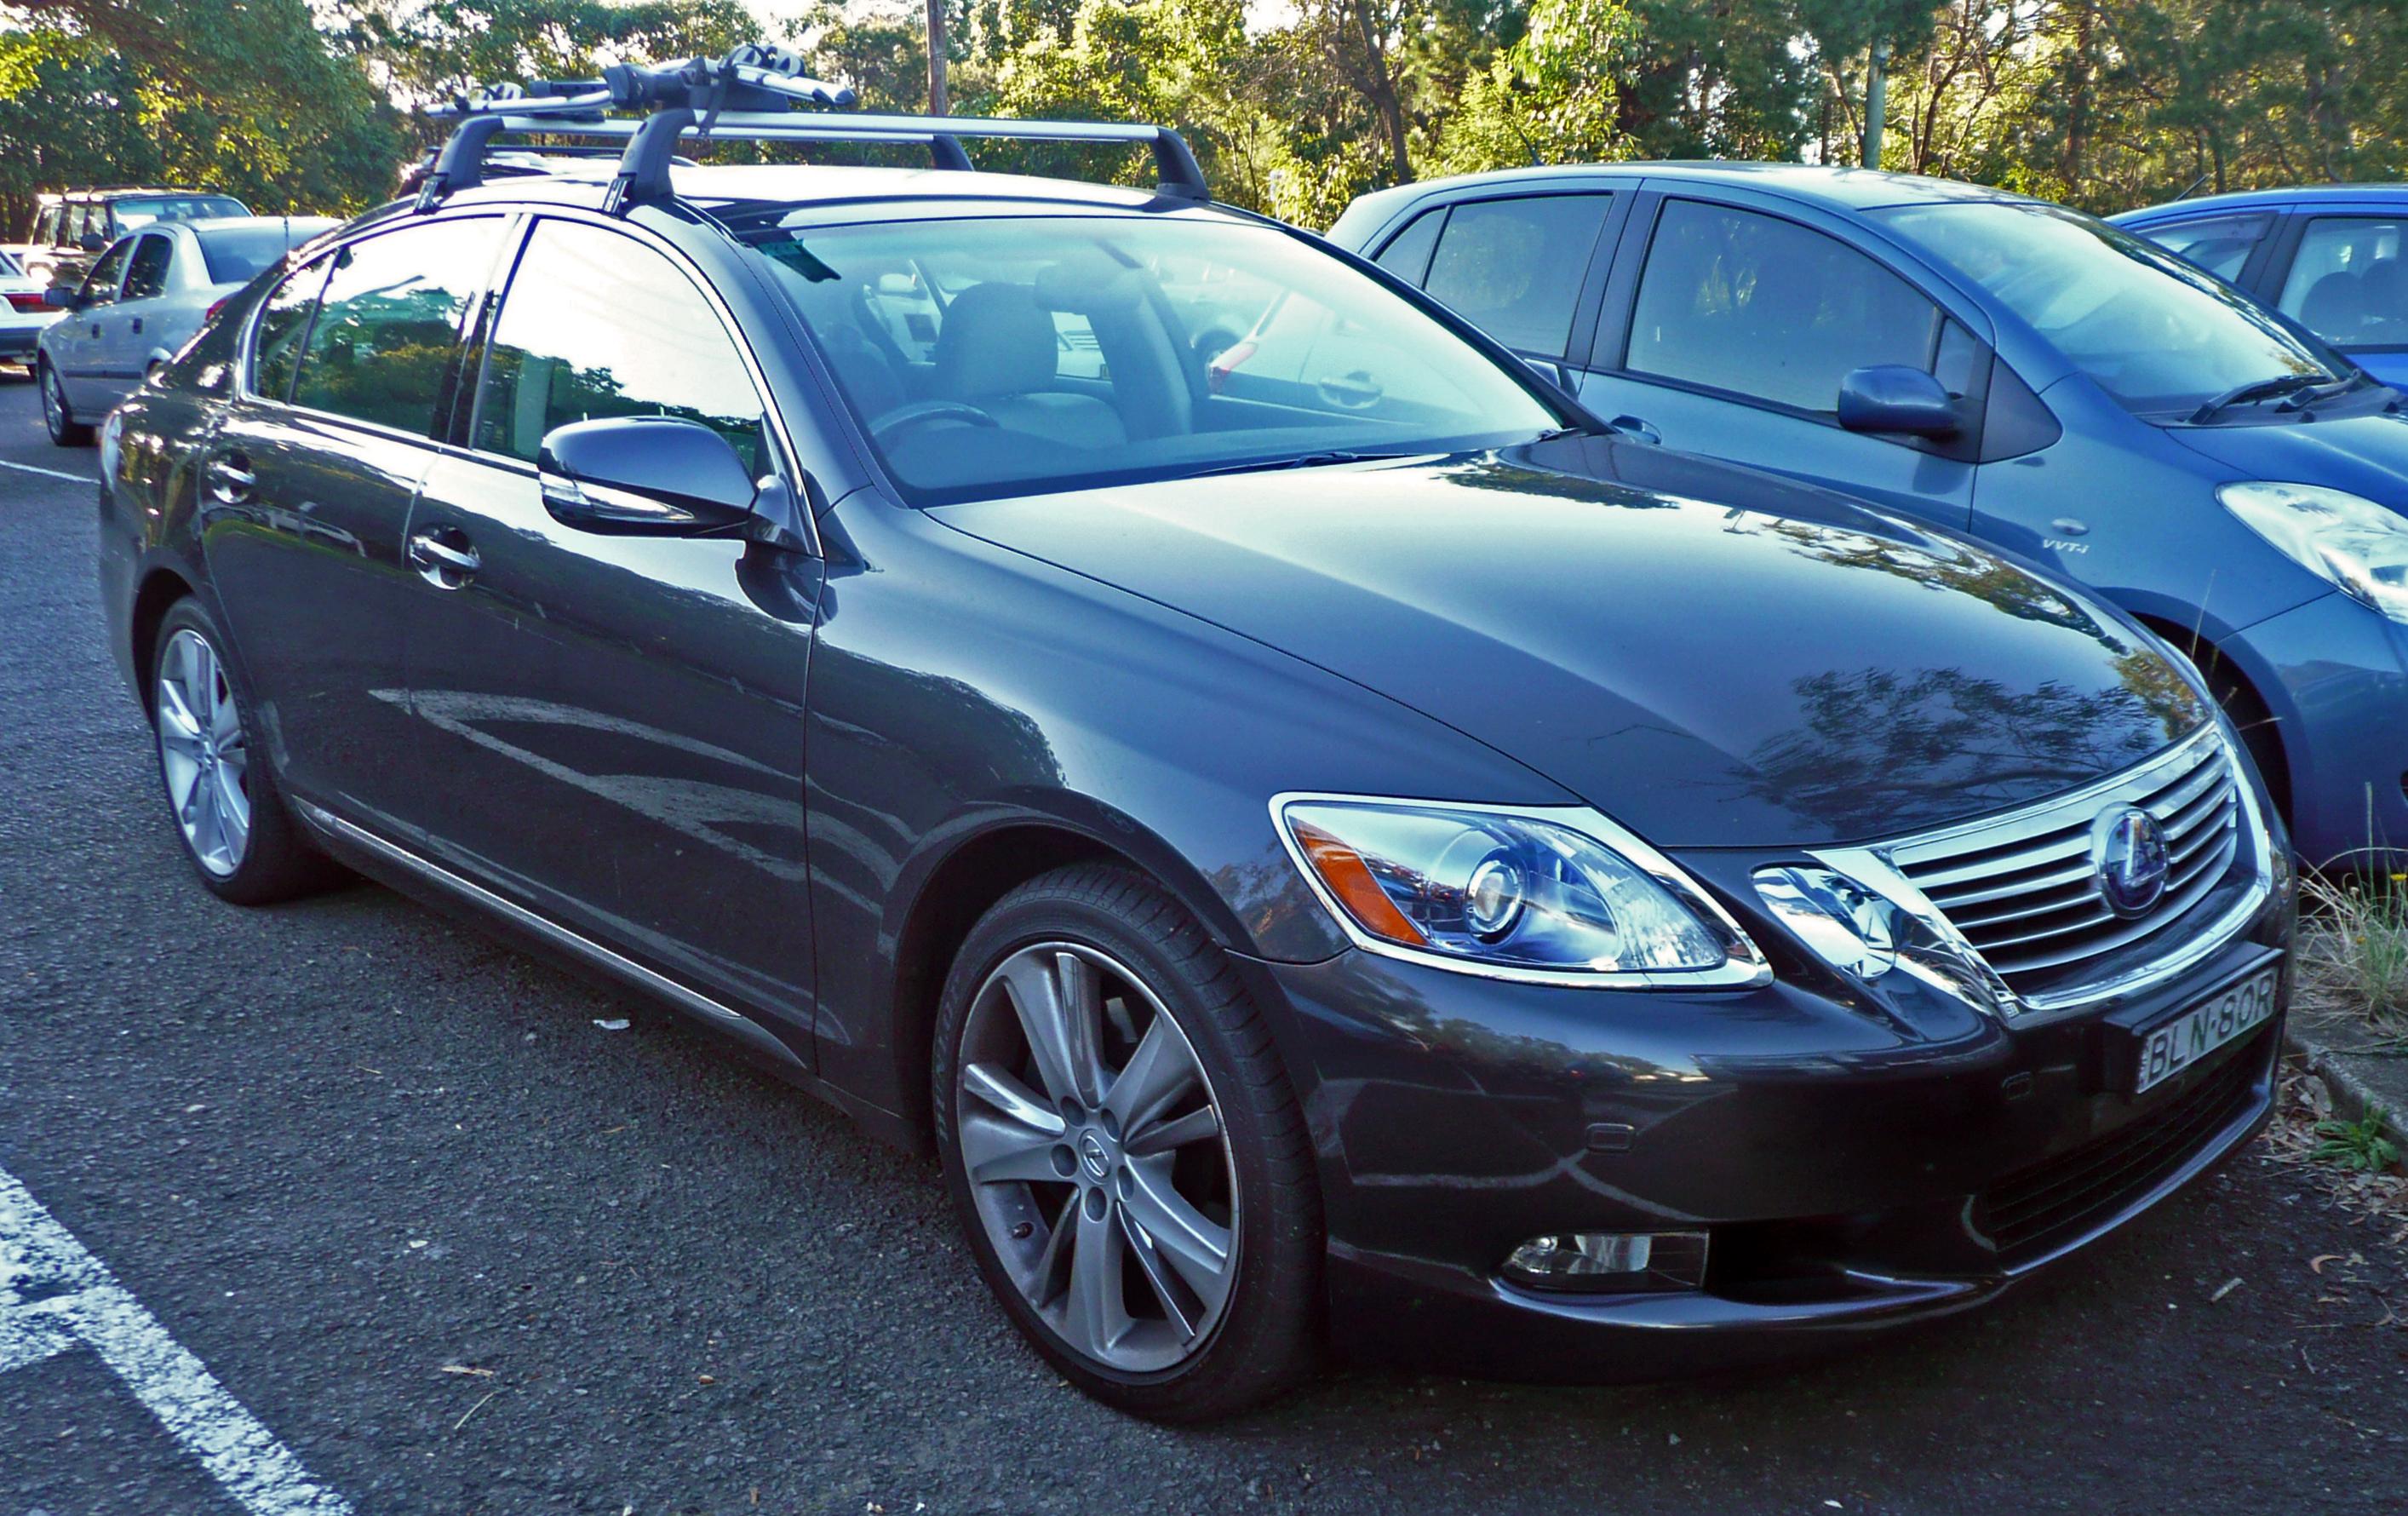 File:2009-2010 Lexus GS 450h (GWS191R) sedan 01.jpg - Wikimedia Commons